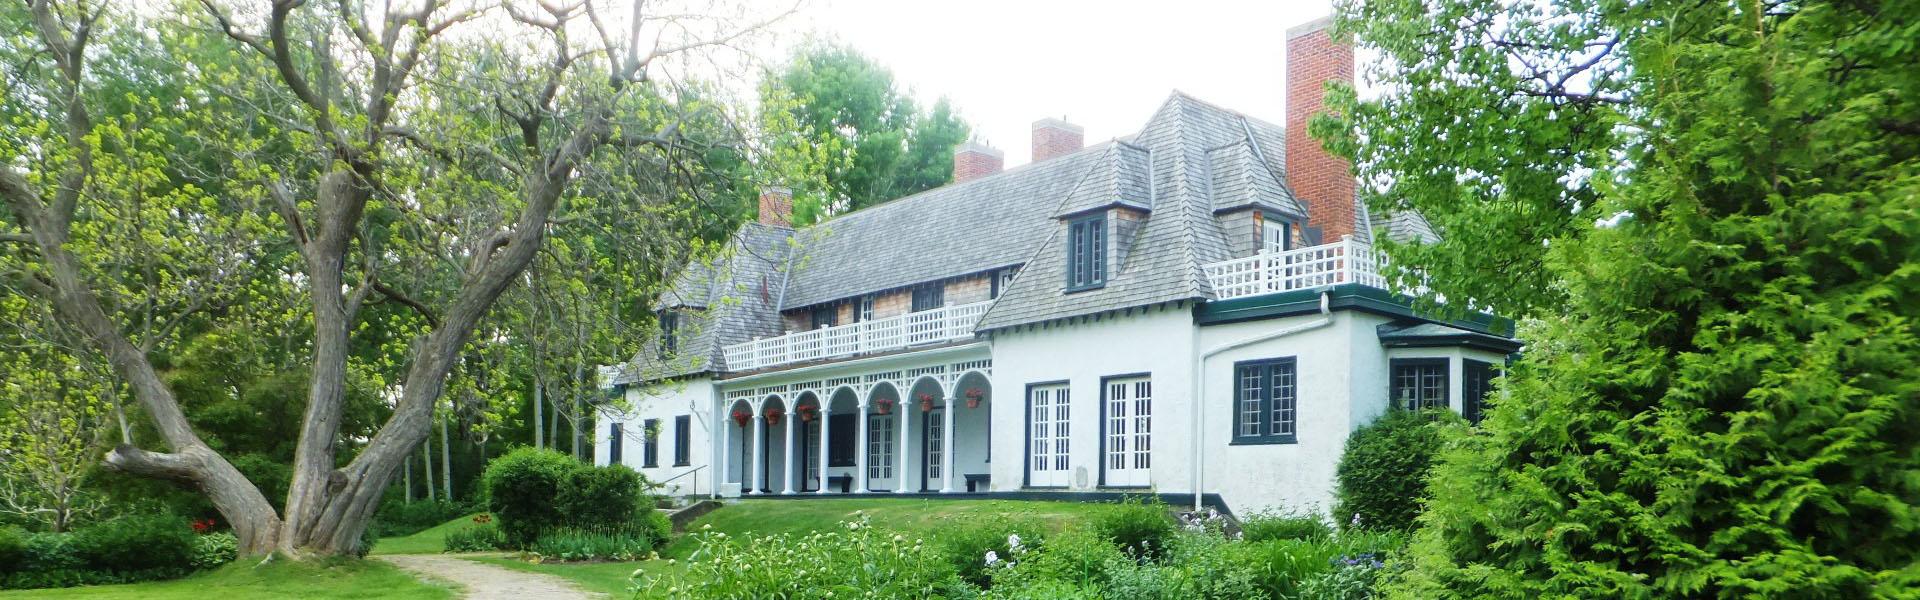 Leacock House